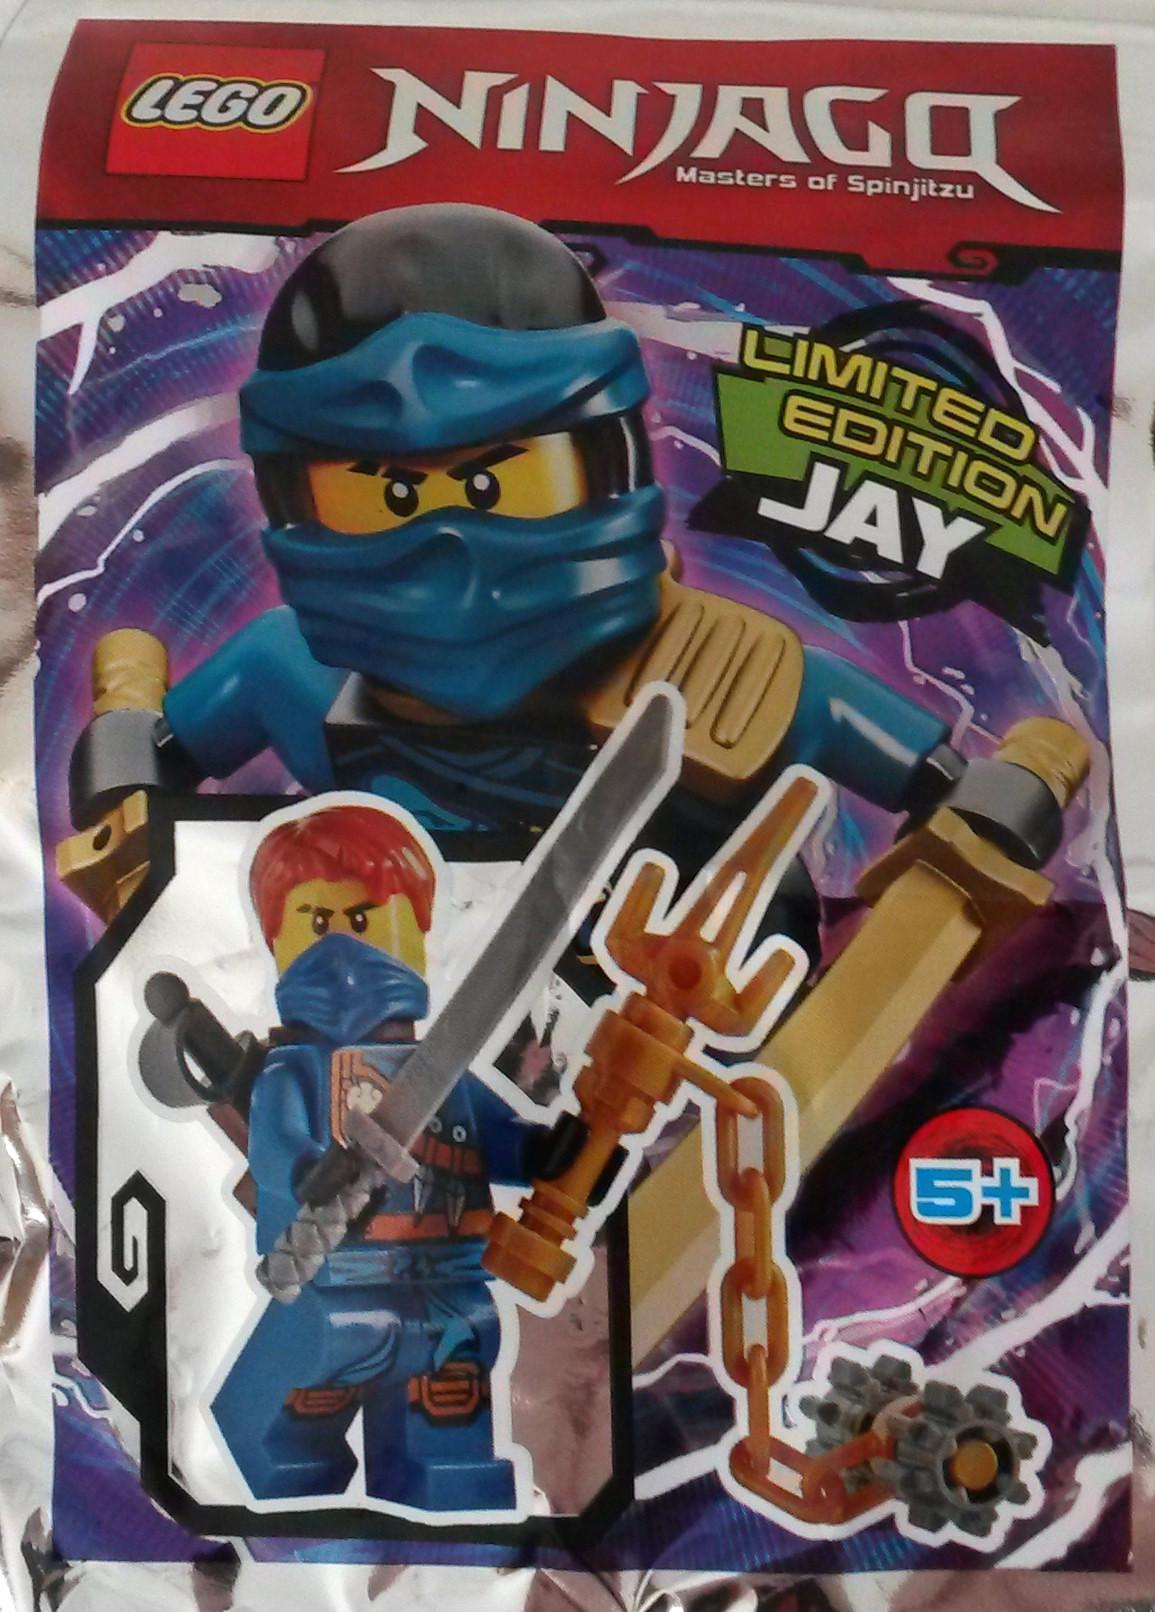 LEGO NINJAGO JAY MINIFIGUR LIMITED EDITION Nr 891615 NEU POLYBAG!!